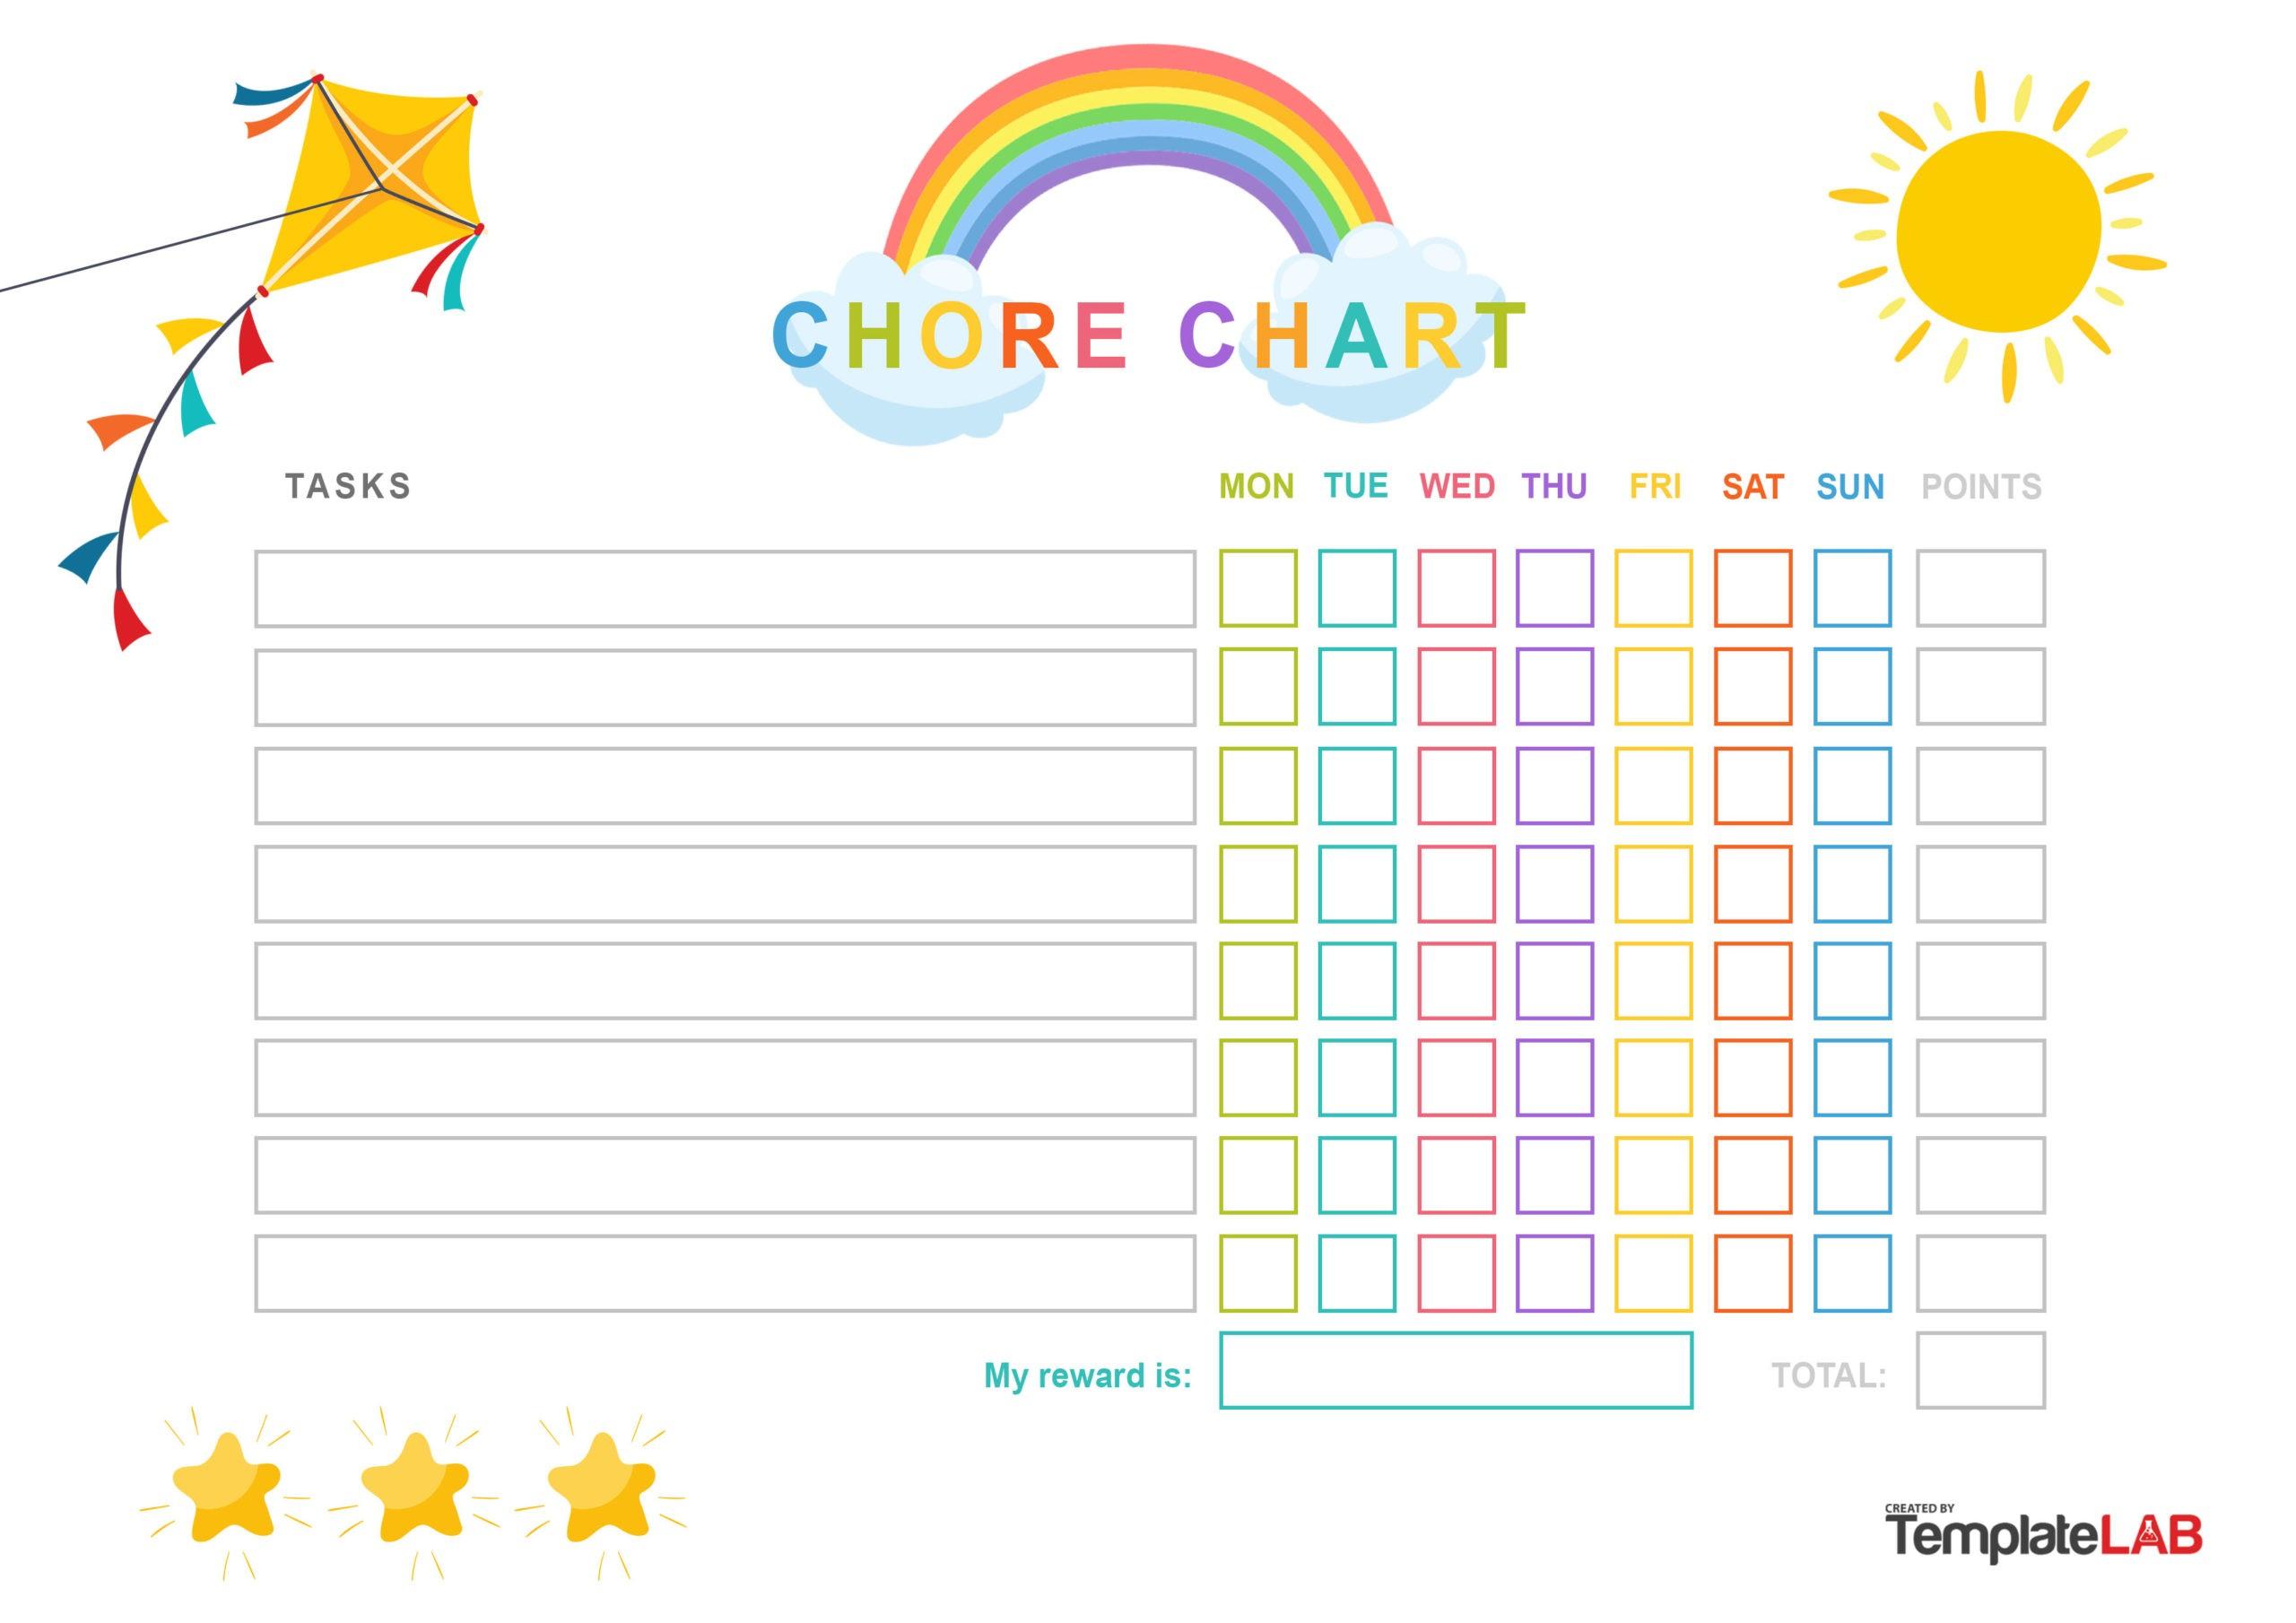 Free Kids Chore Chart - TemplateLab.com